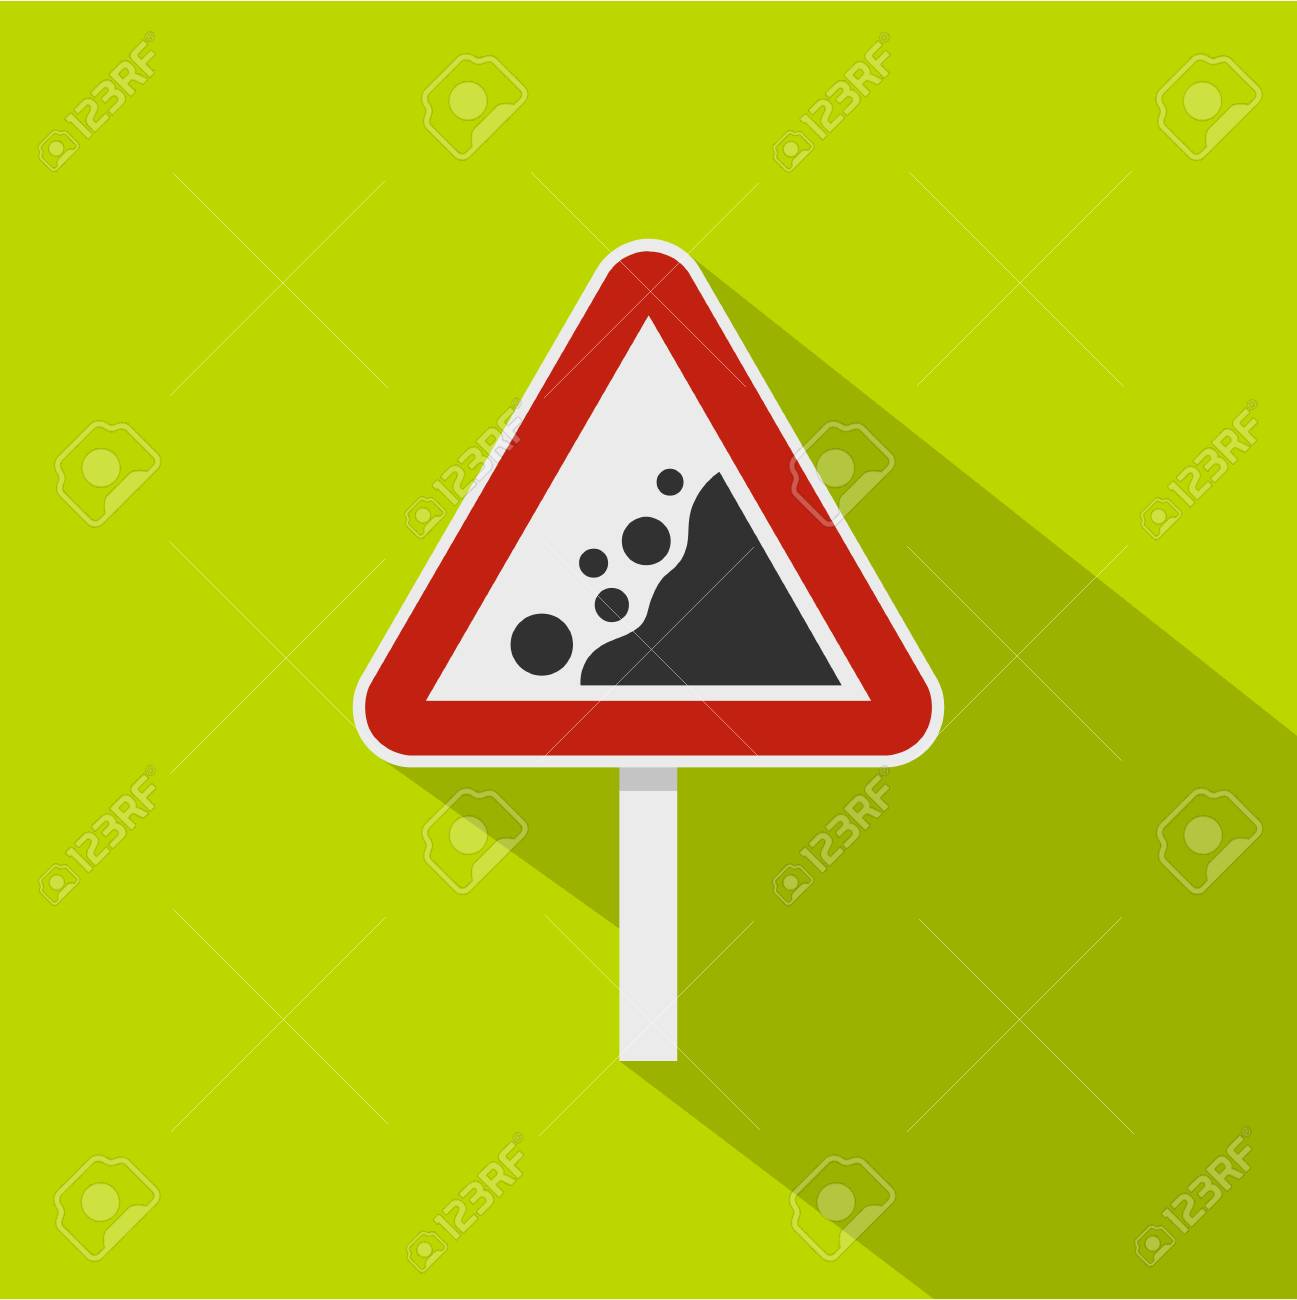 Rockfall traffic sign icon. Flat illustration of rockfall traffic sign vector icon for web isolated on lime background - 66115068